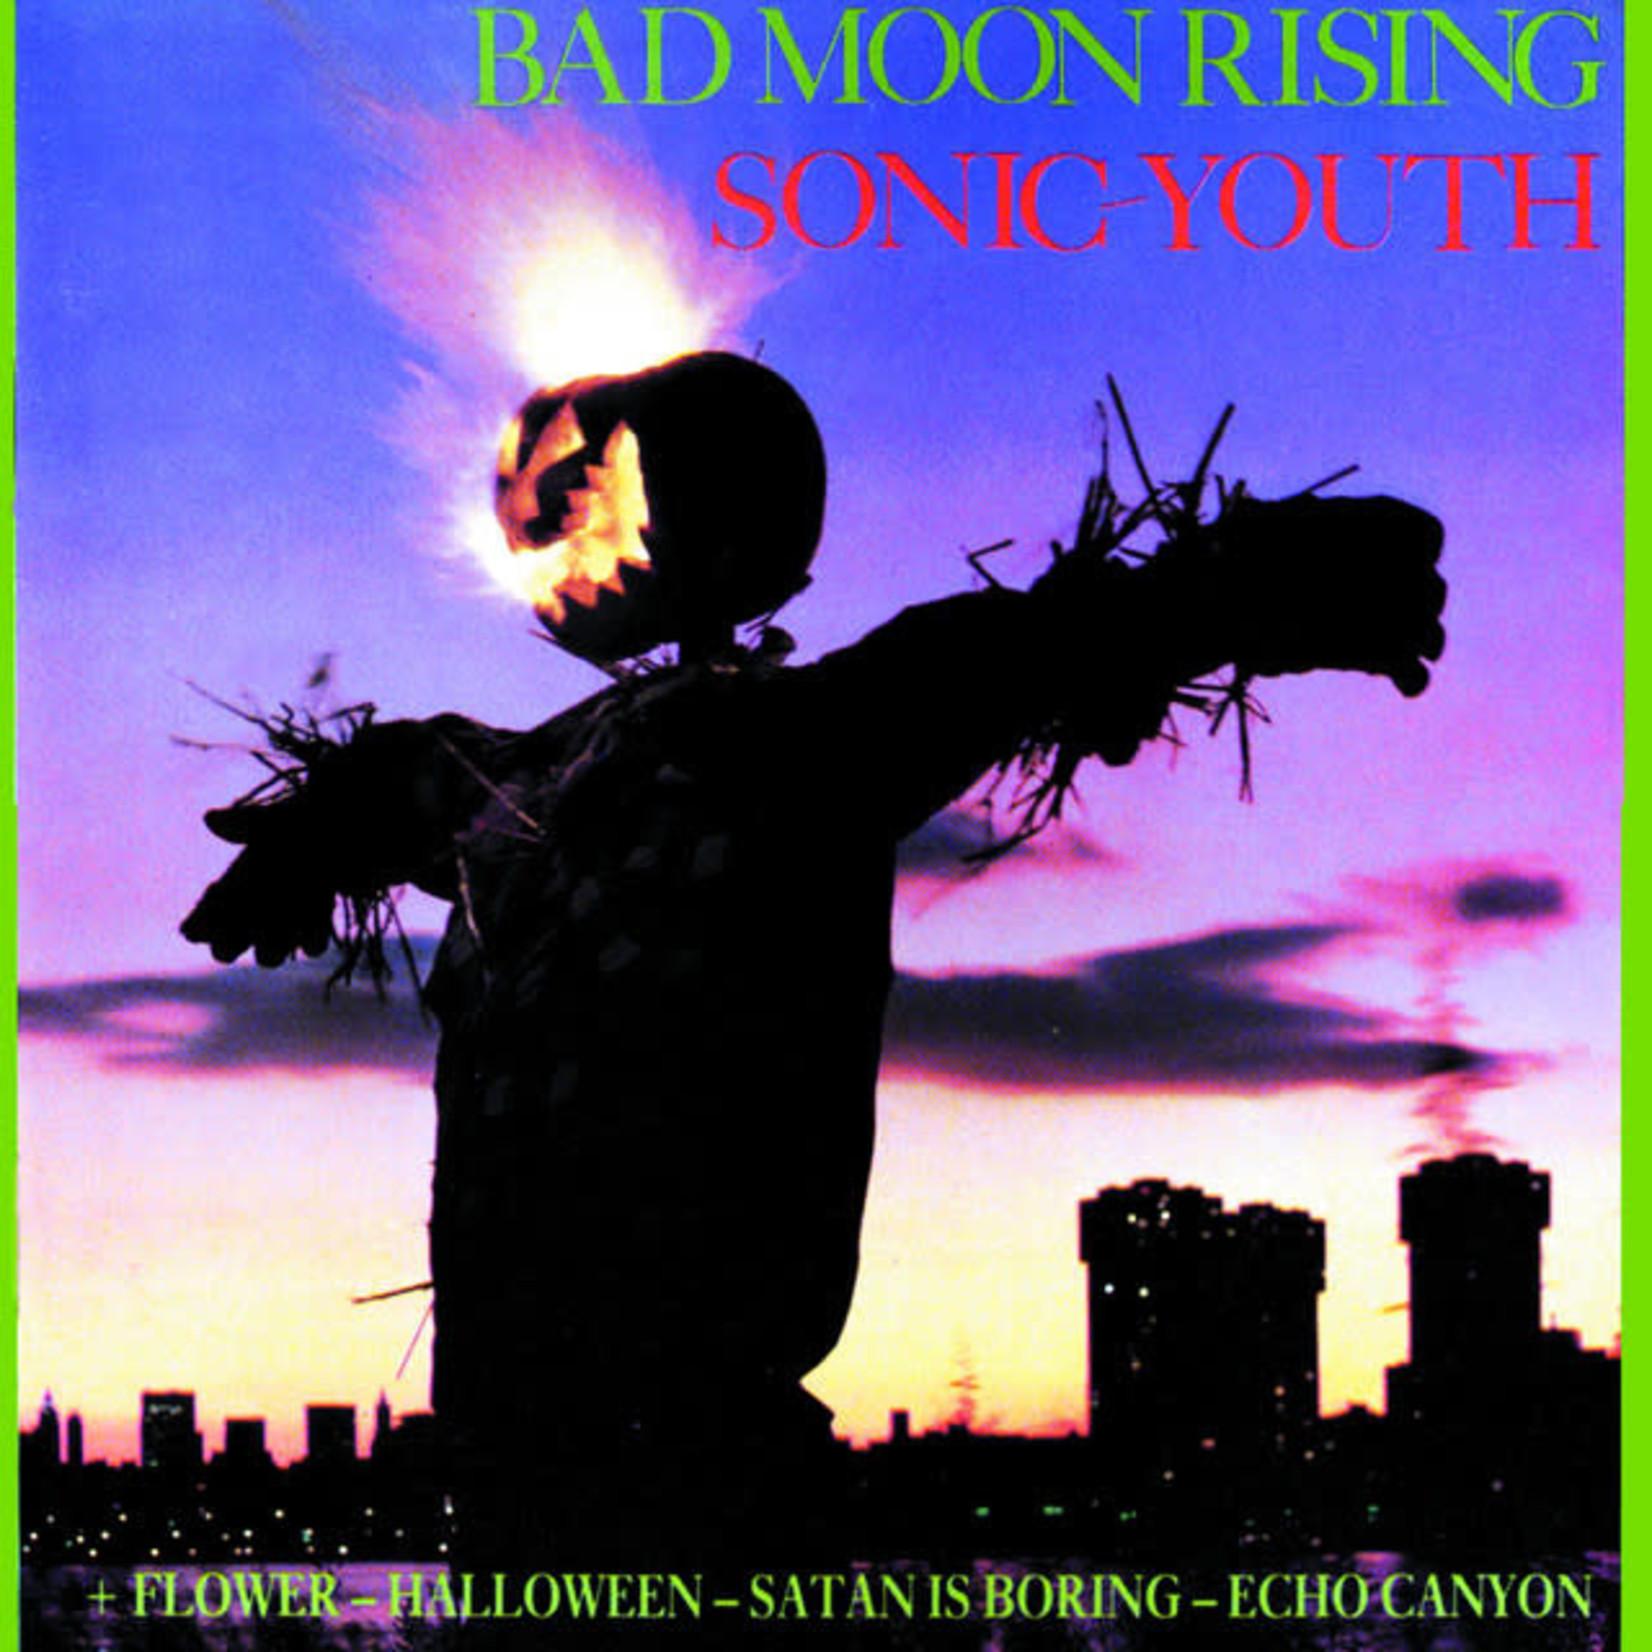 Vinyl Sonic Youth - Bad Moon Rising